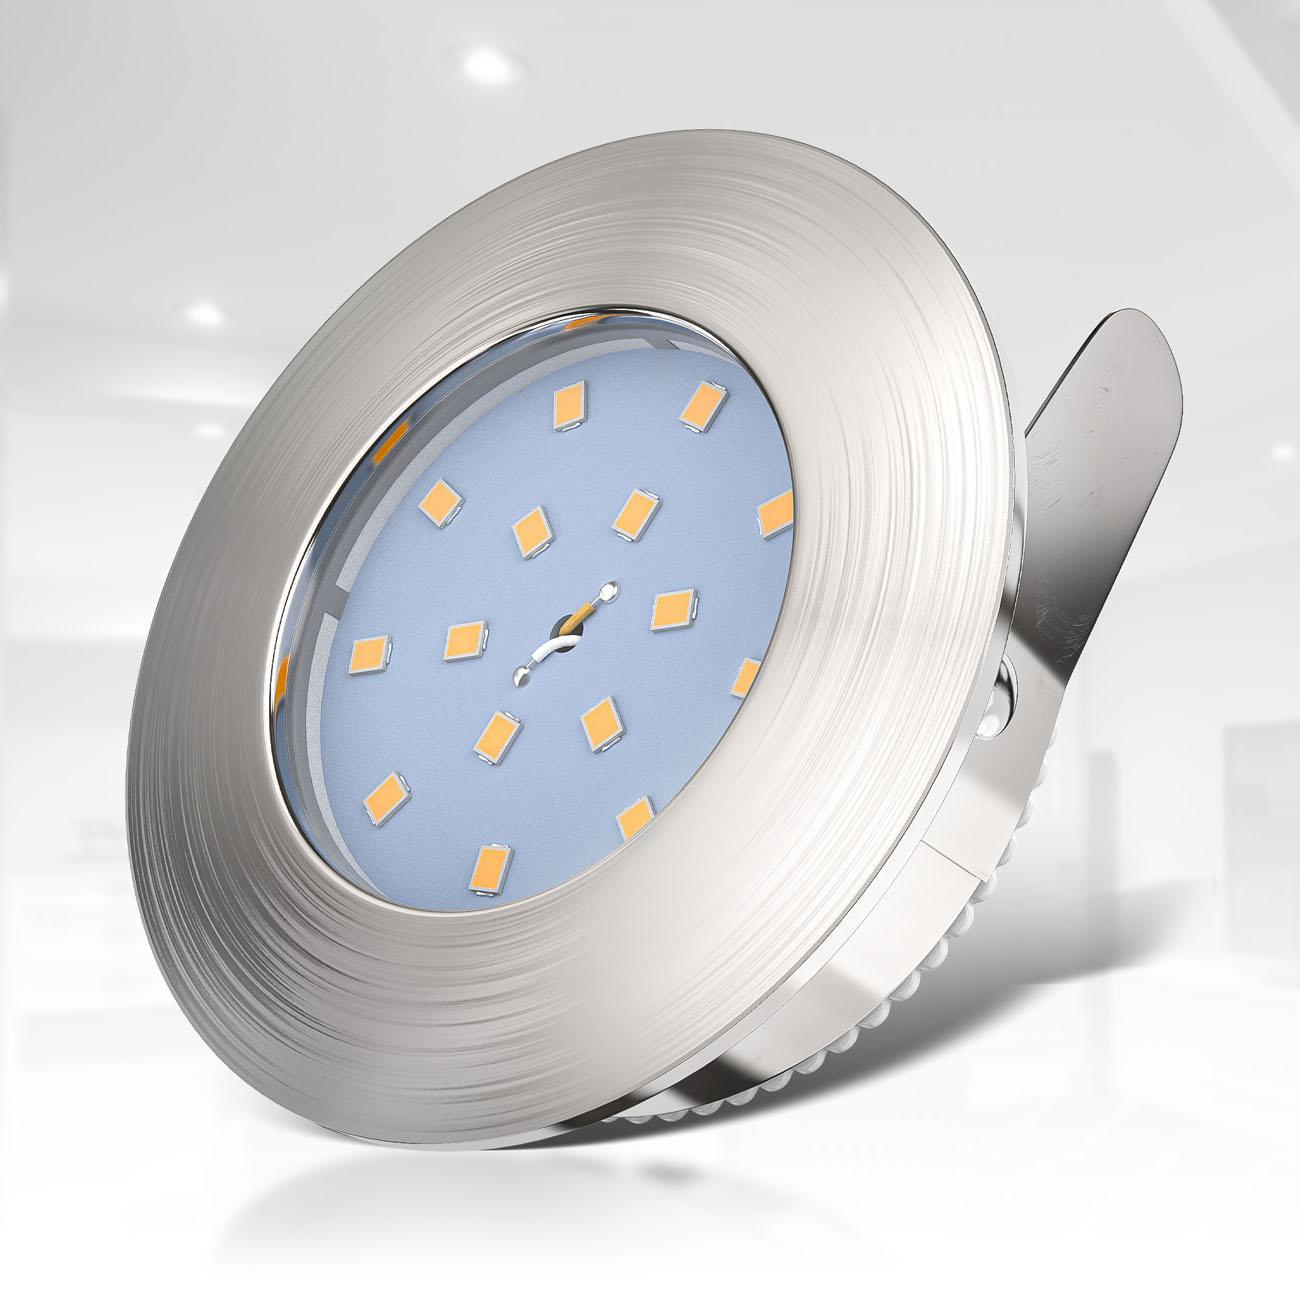 LED Einbaustrahler   Bad Einbauleuchte 5er SET   ultra flach 5W IP44 dimmbar - 4